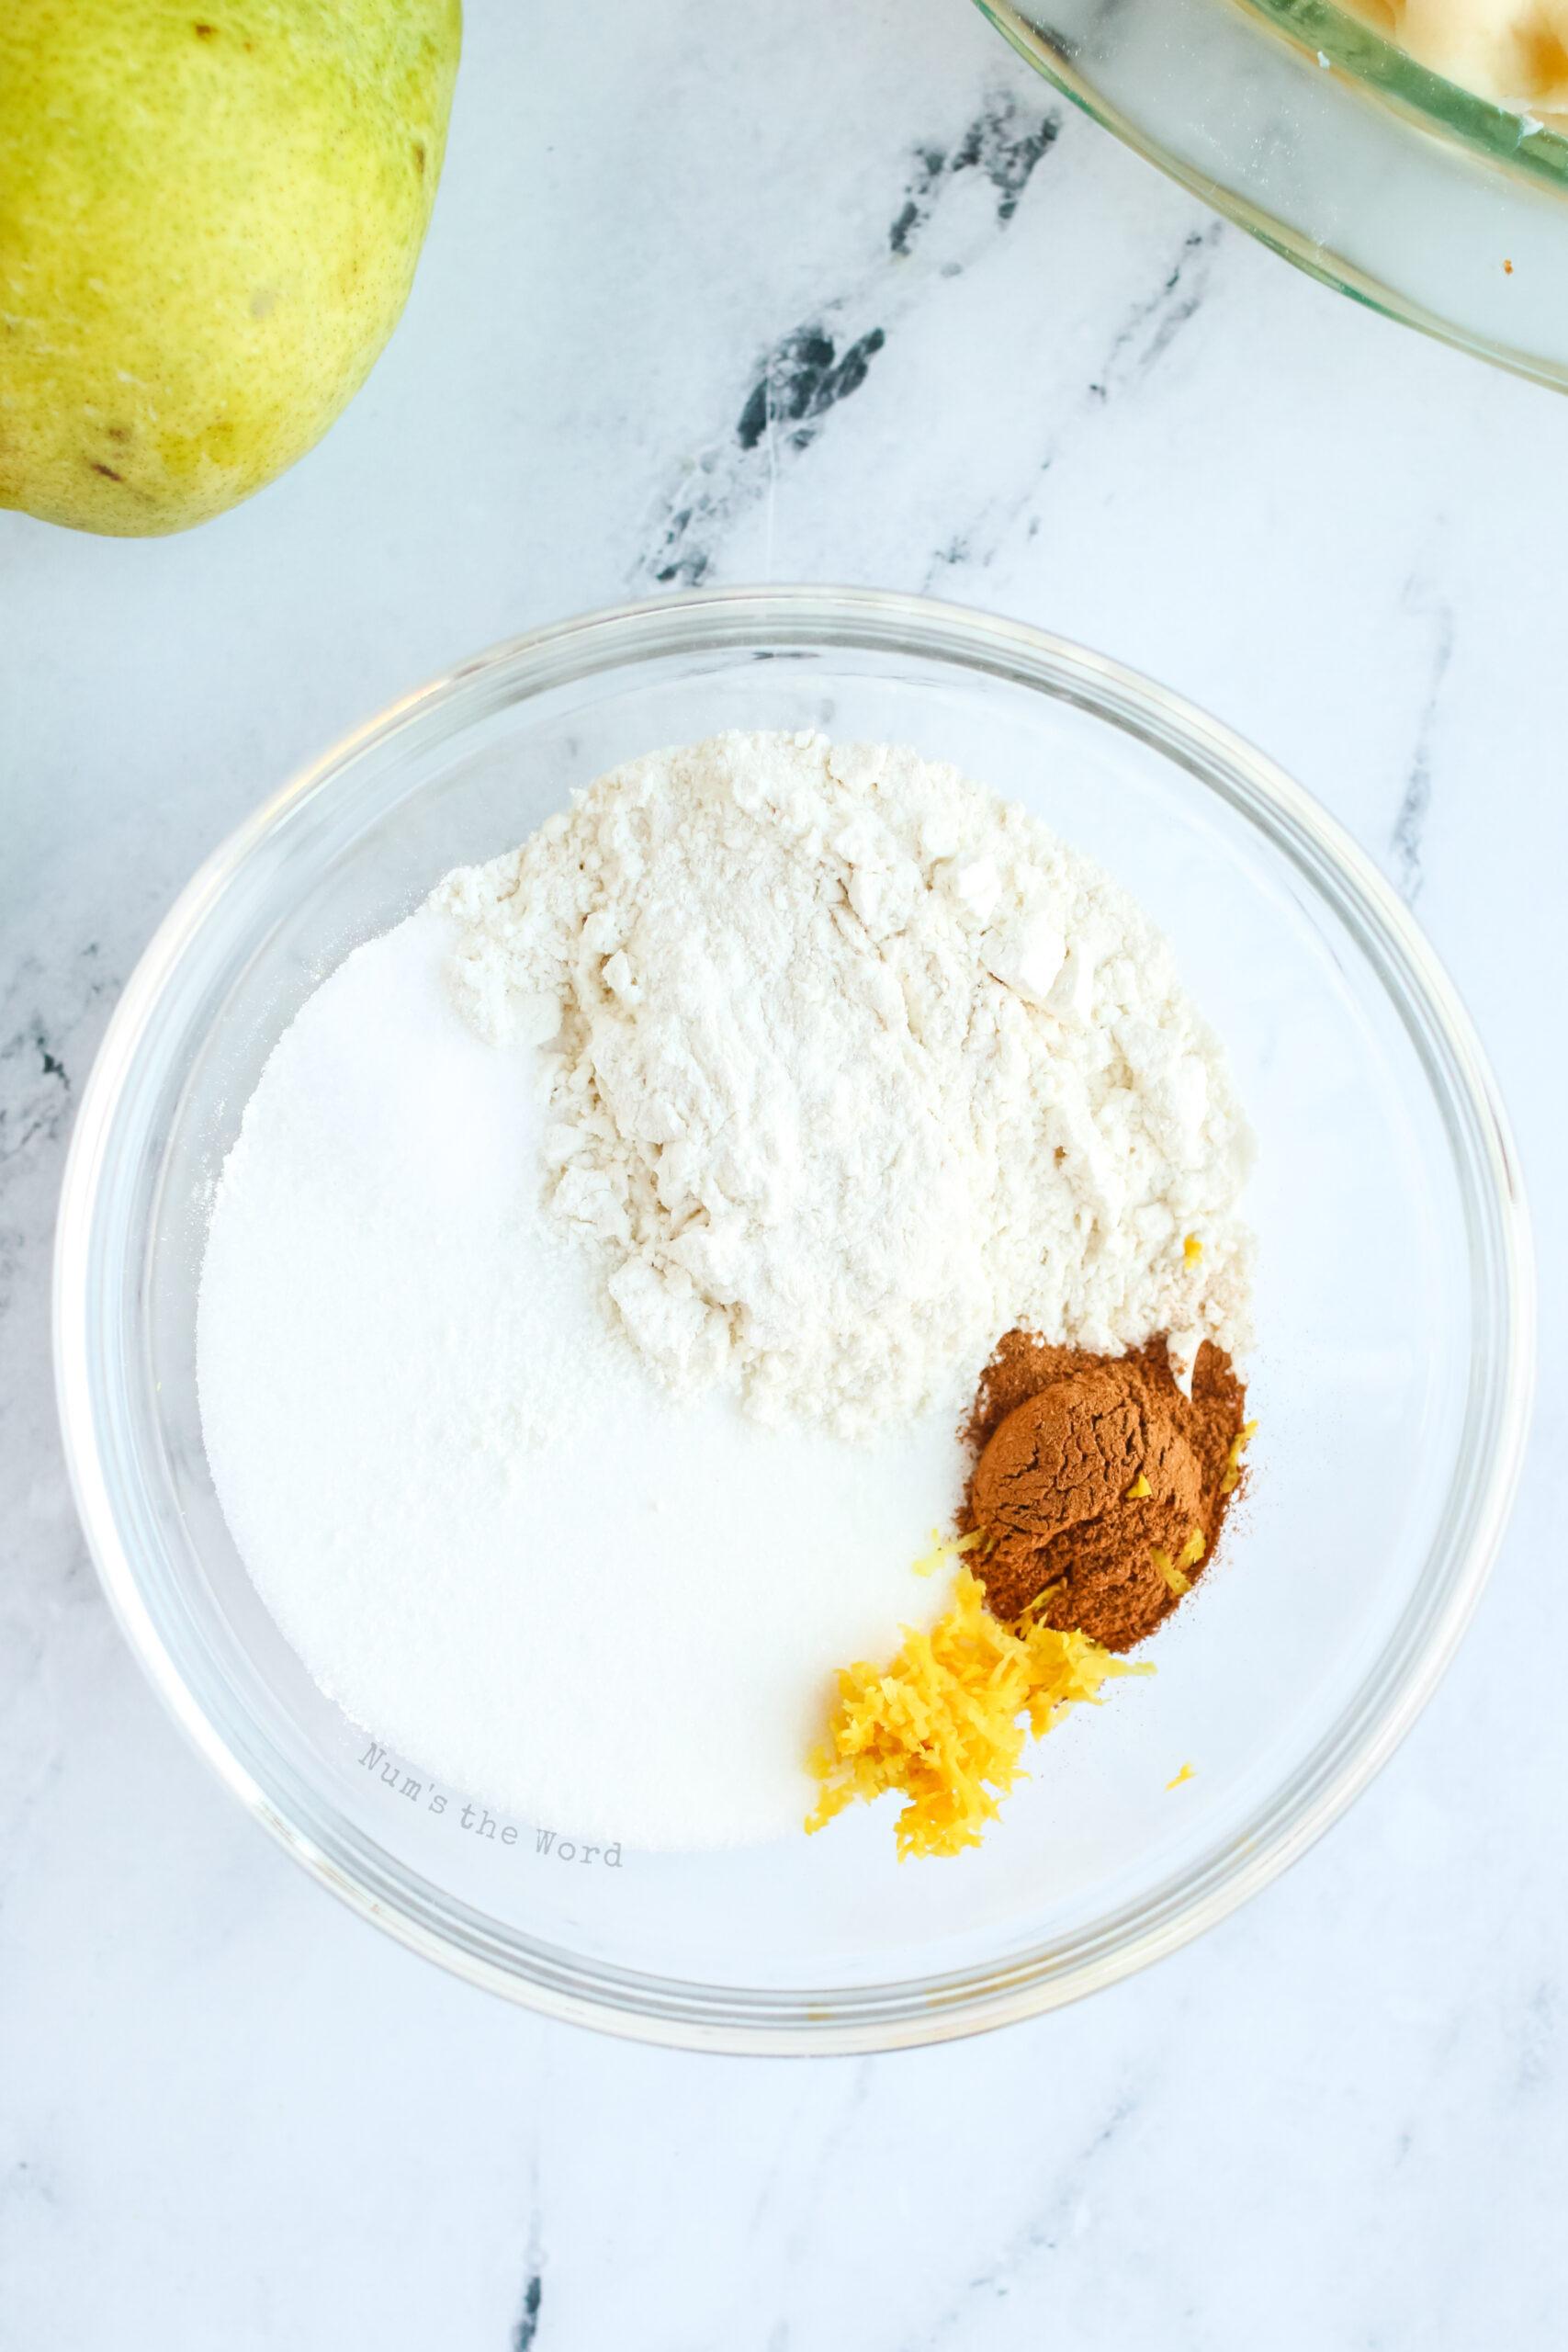 sugar, flour, salt, cinnamon and lime zest added to a bowl